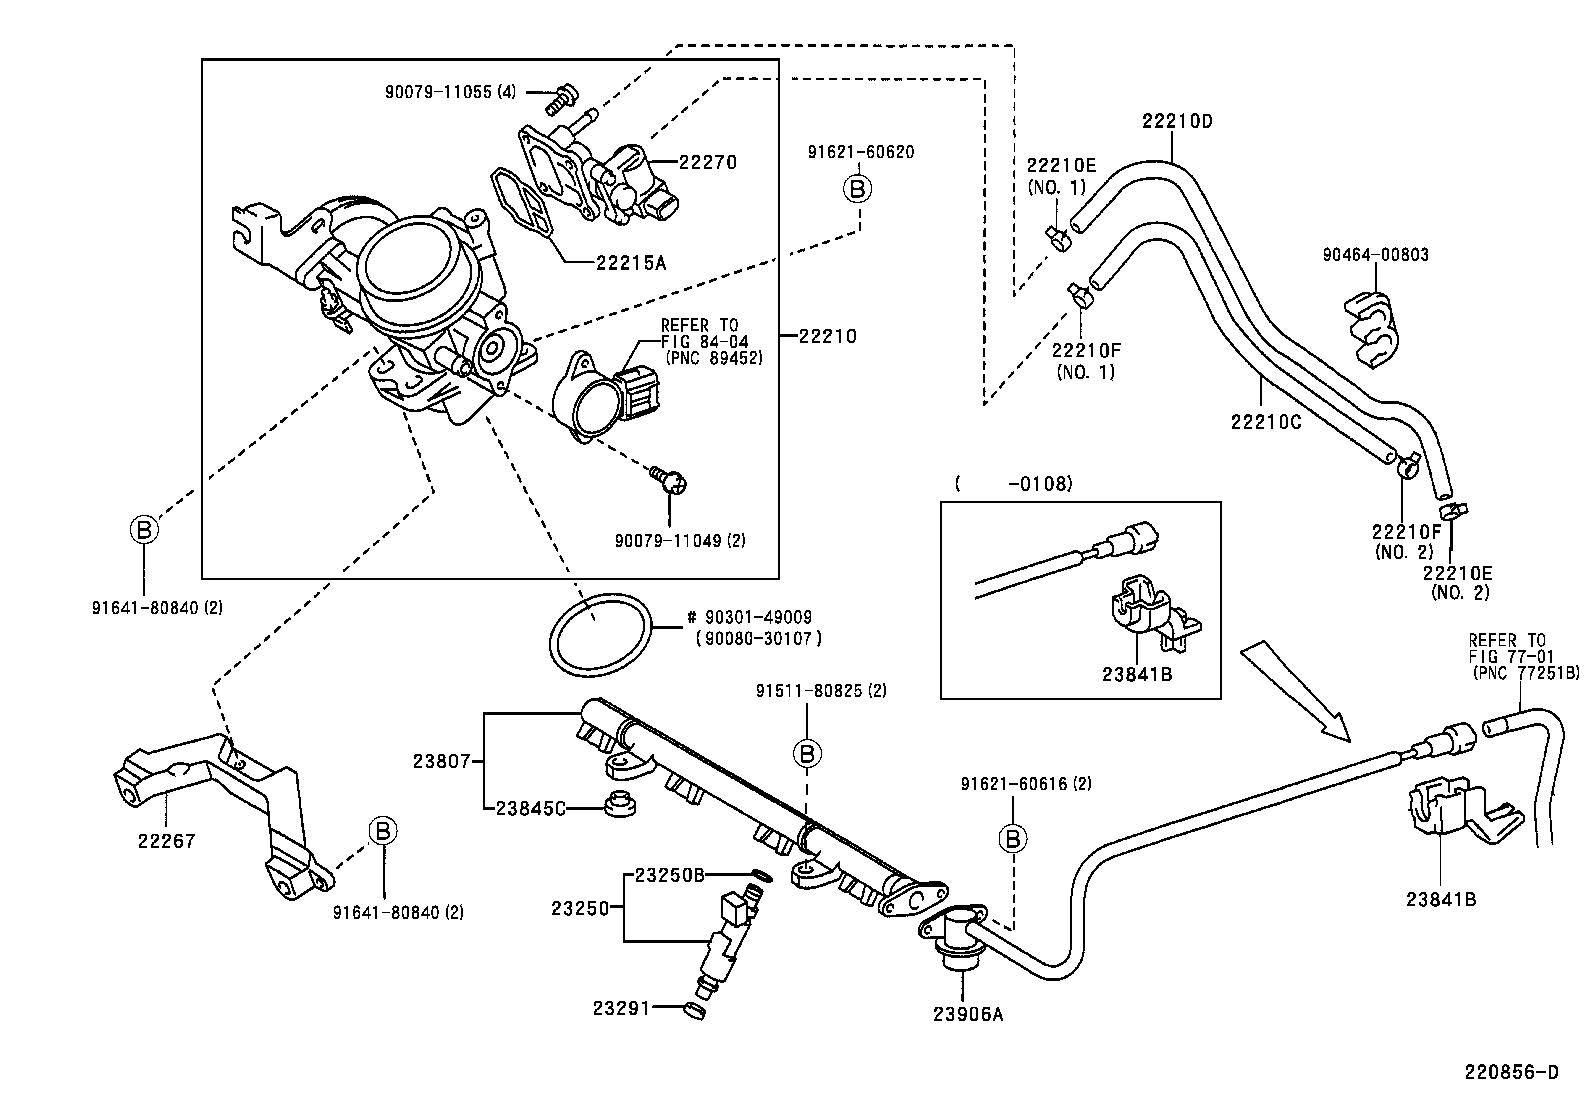 1993 mazda b2200 wiring diagram 1989 toyota pickup tail light b2000 fuel pump relay